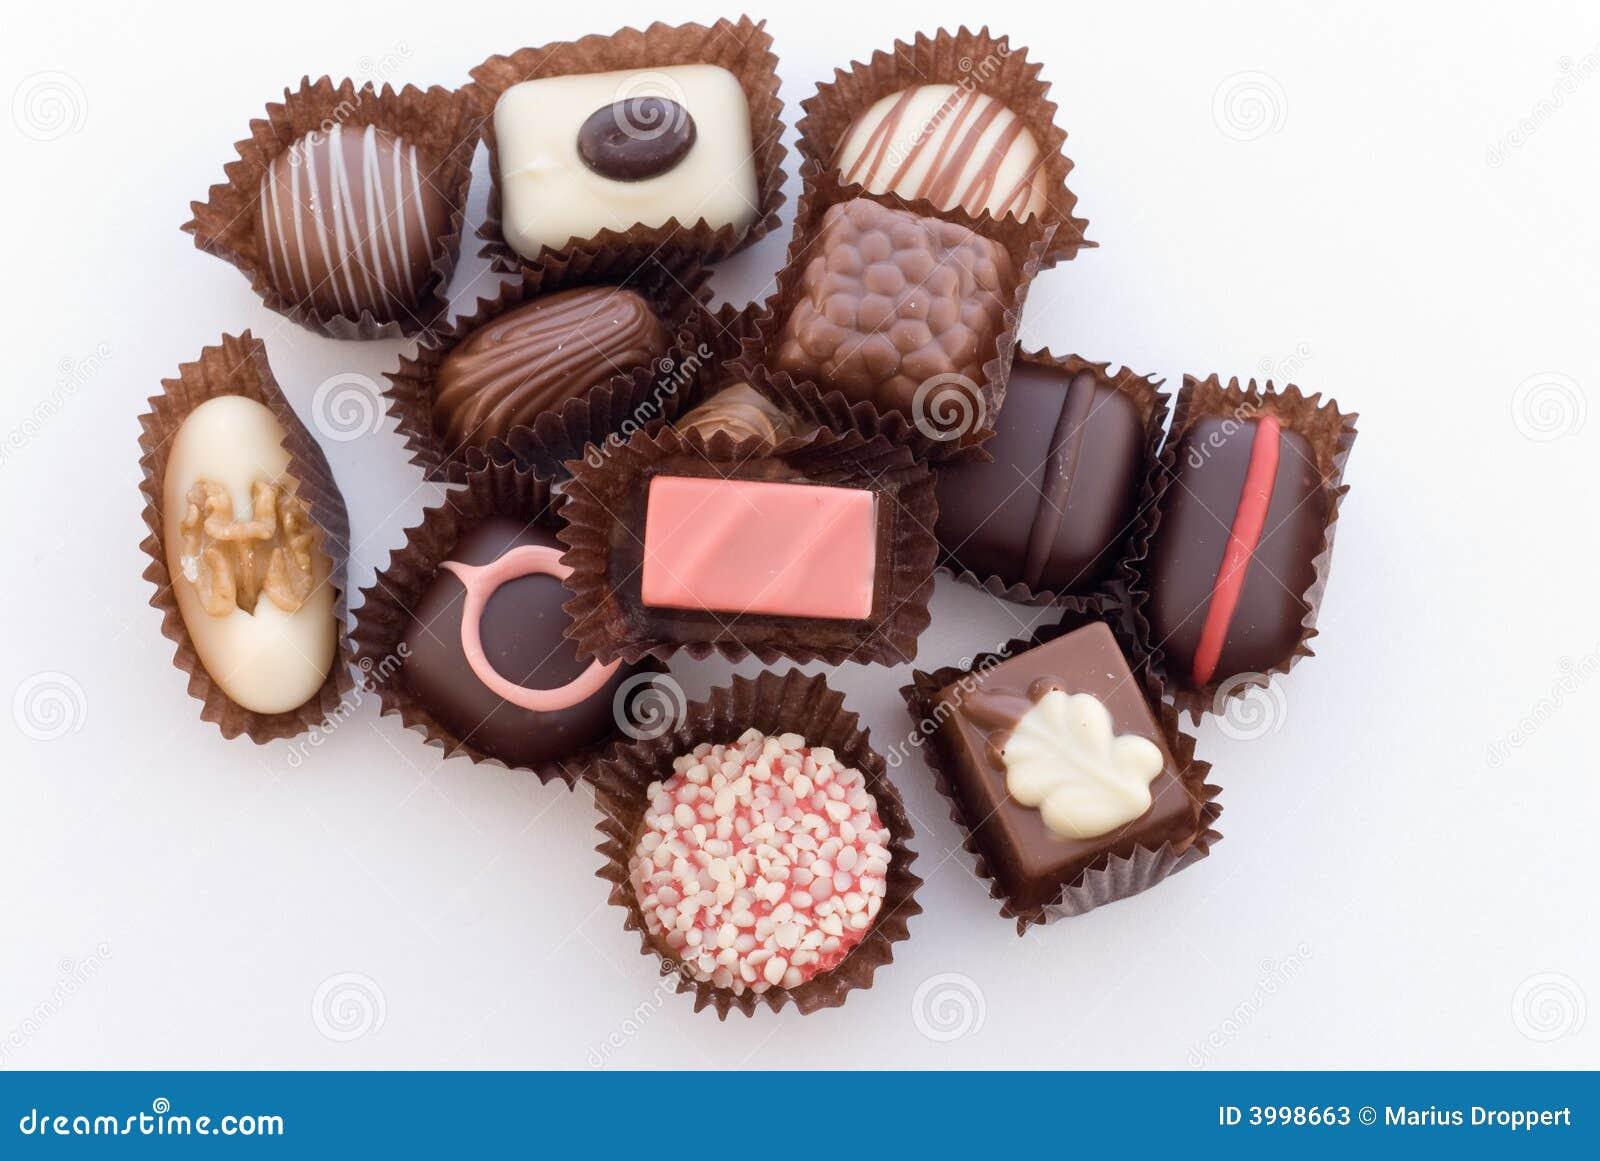 Close up of various colorful chocolat bonbons 4